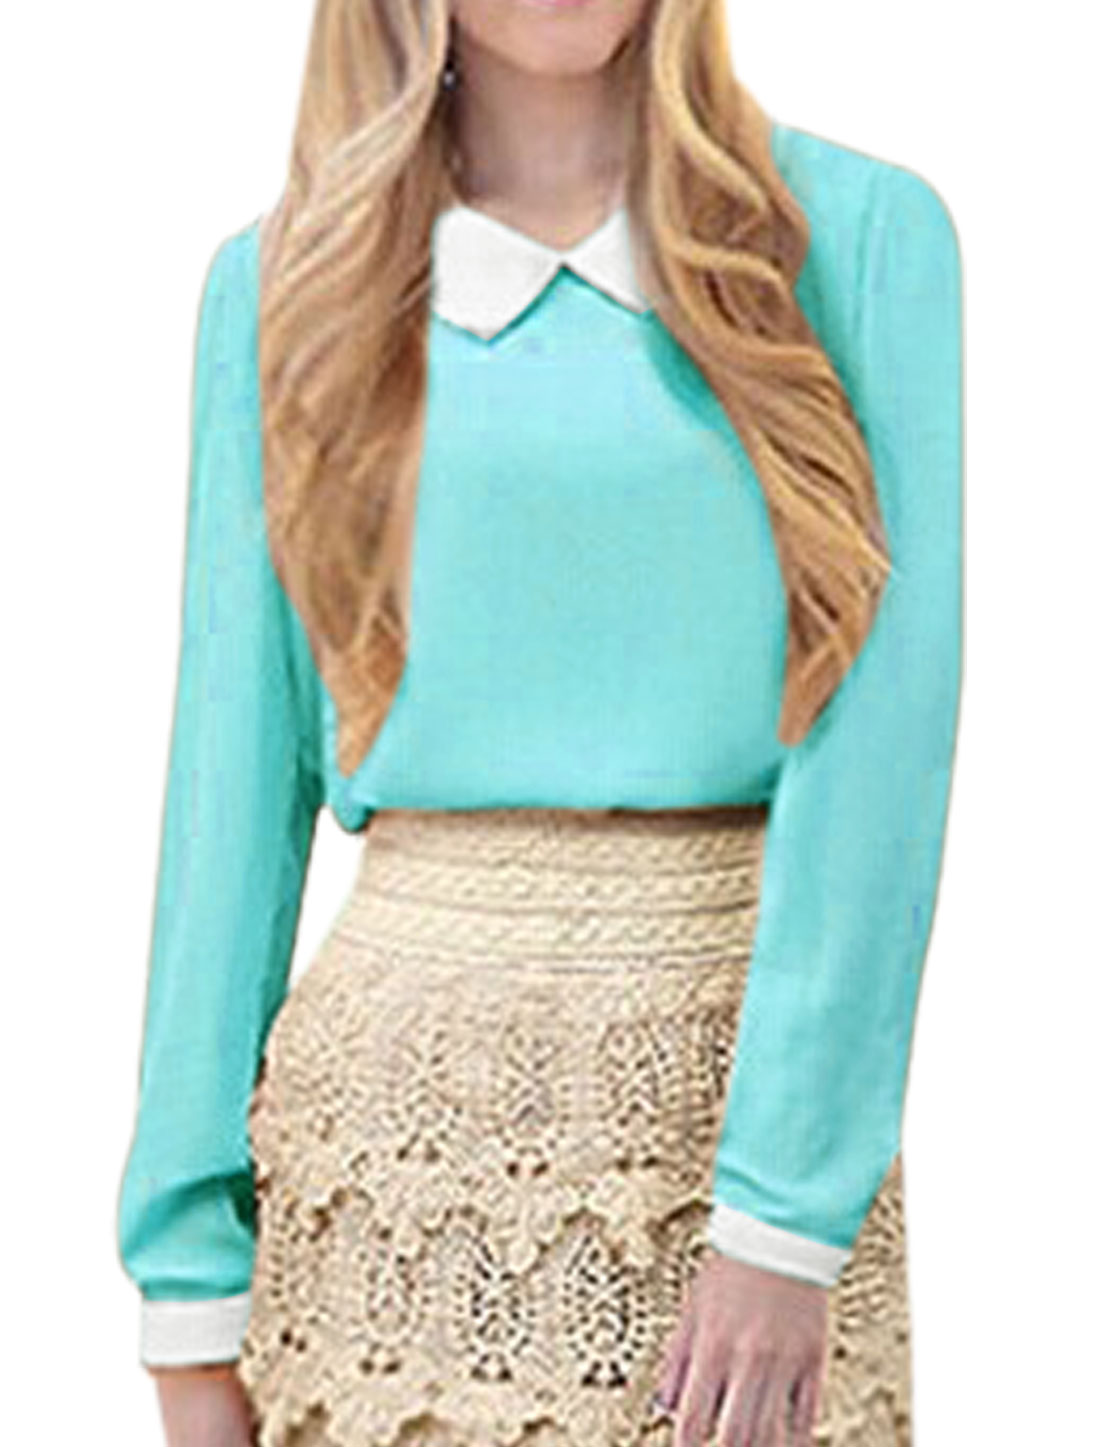 Ladies Peter Pan Collar Long Sleeves Chiffon Shirt Sky Blue M